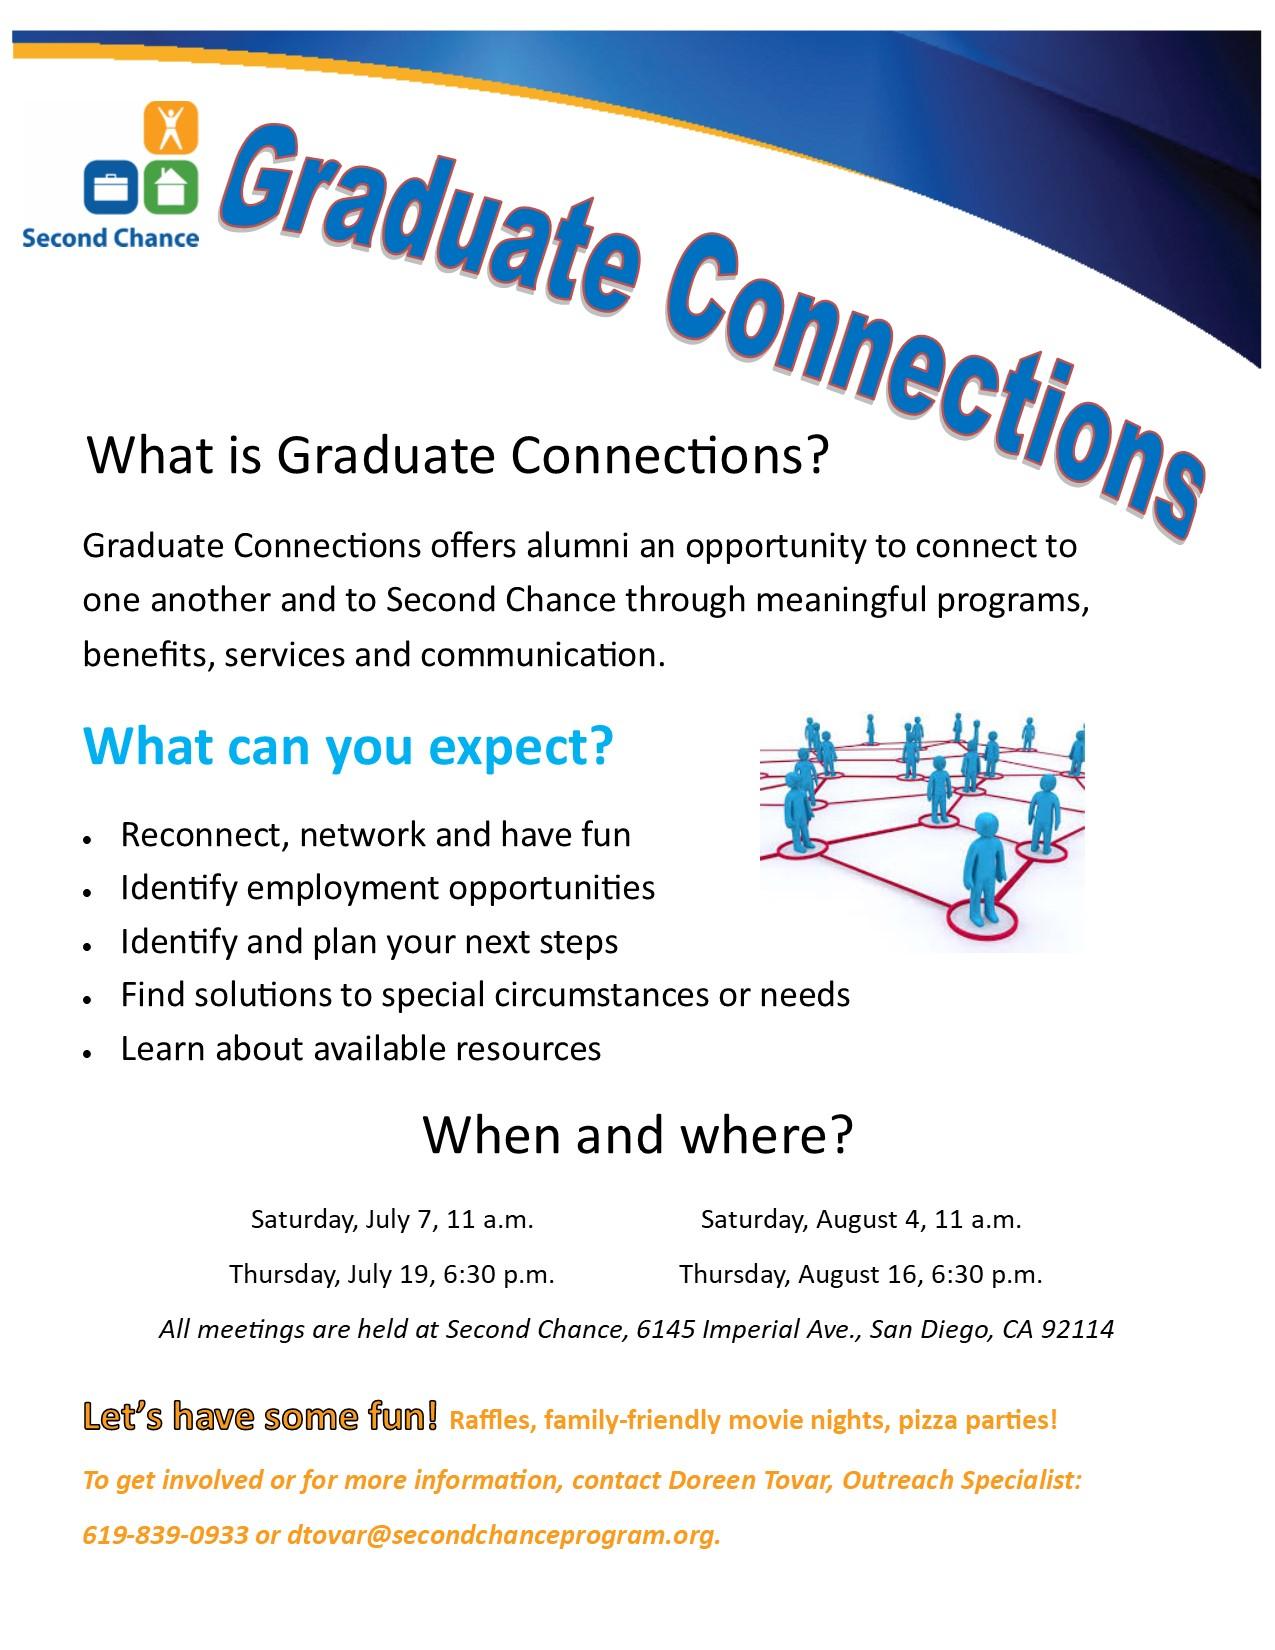 Second Chance Graduates